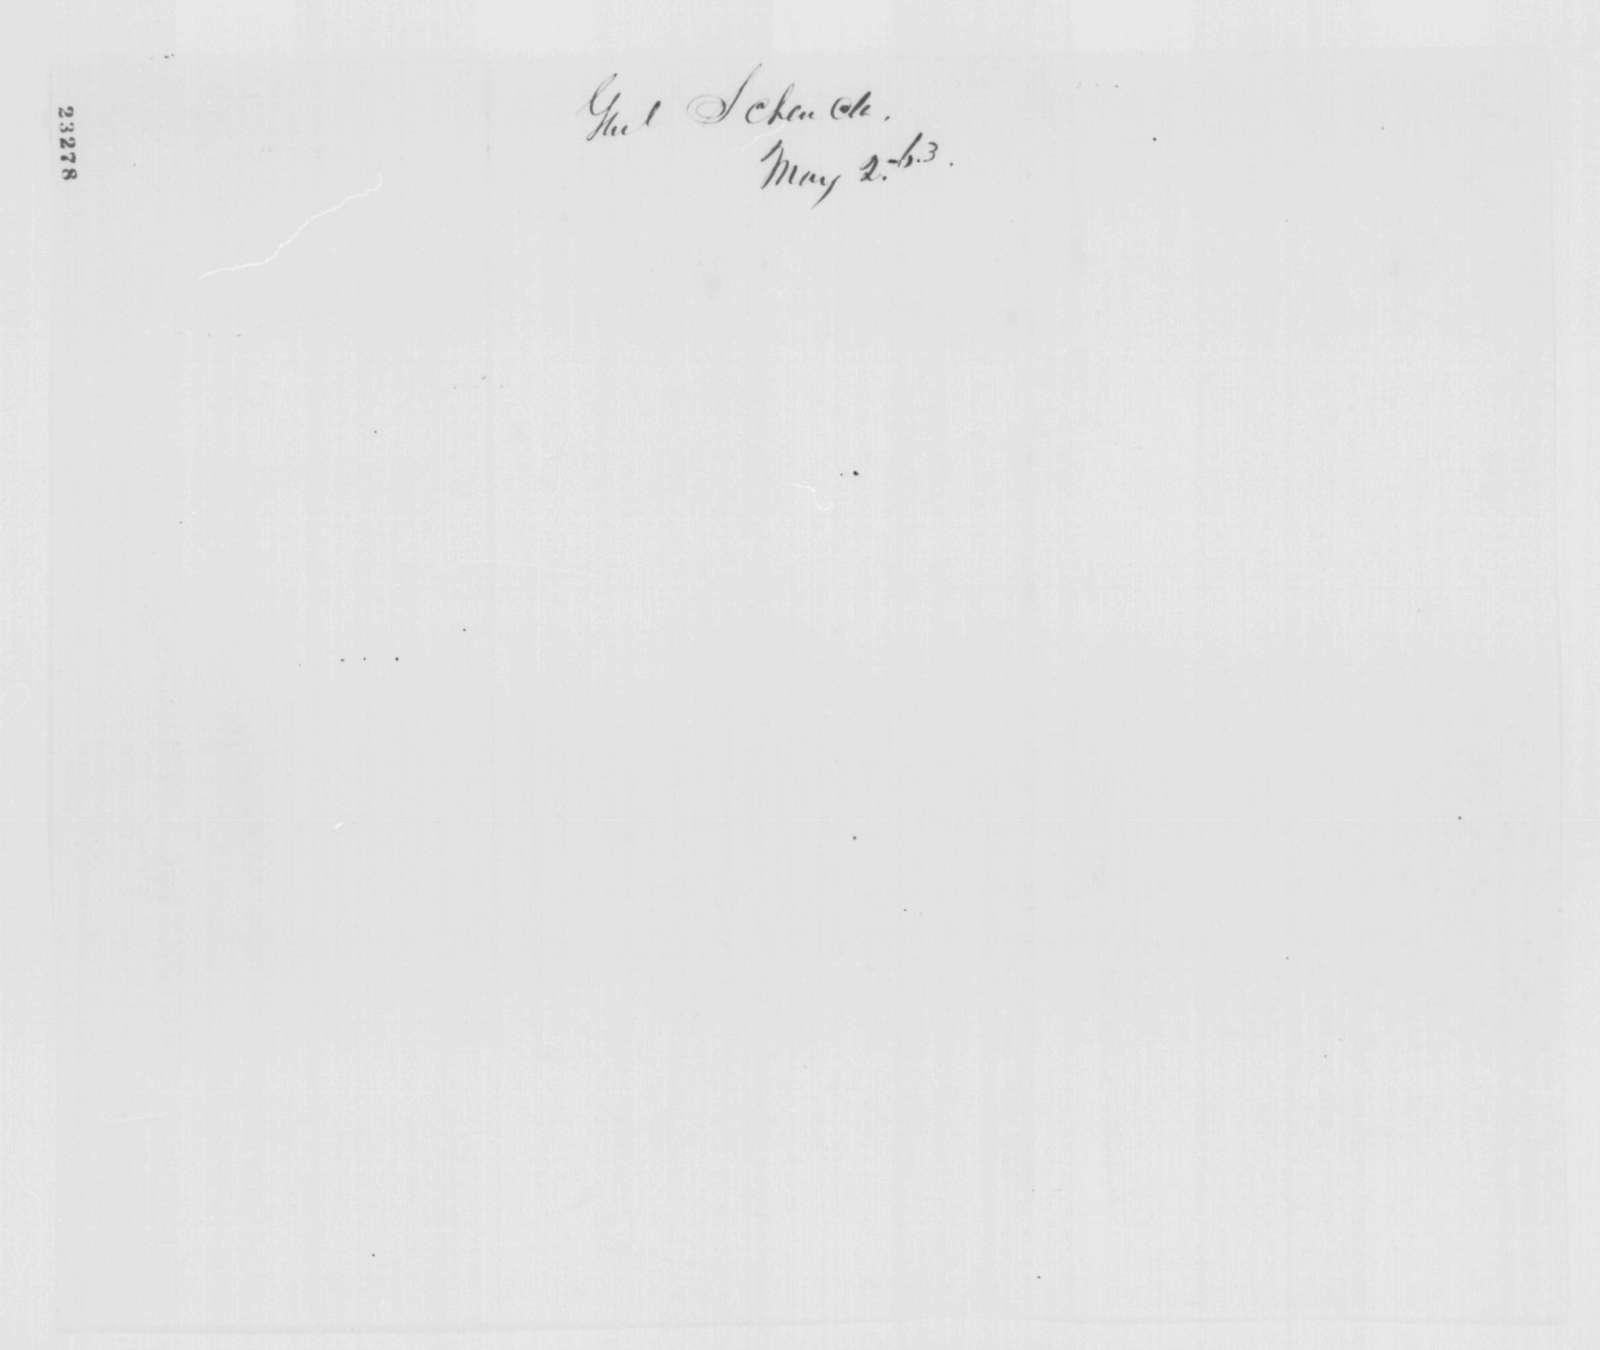 Robert C. Schenck to Henry W. Halleck, Saturday, May 02, 1863  (Telegram concerning military affairs)